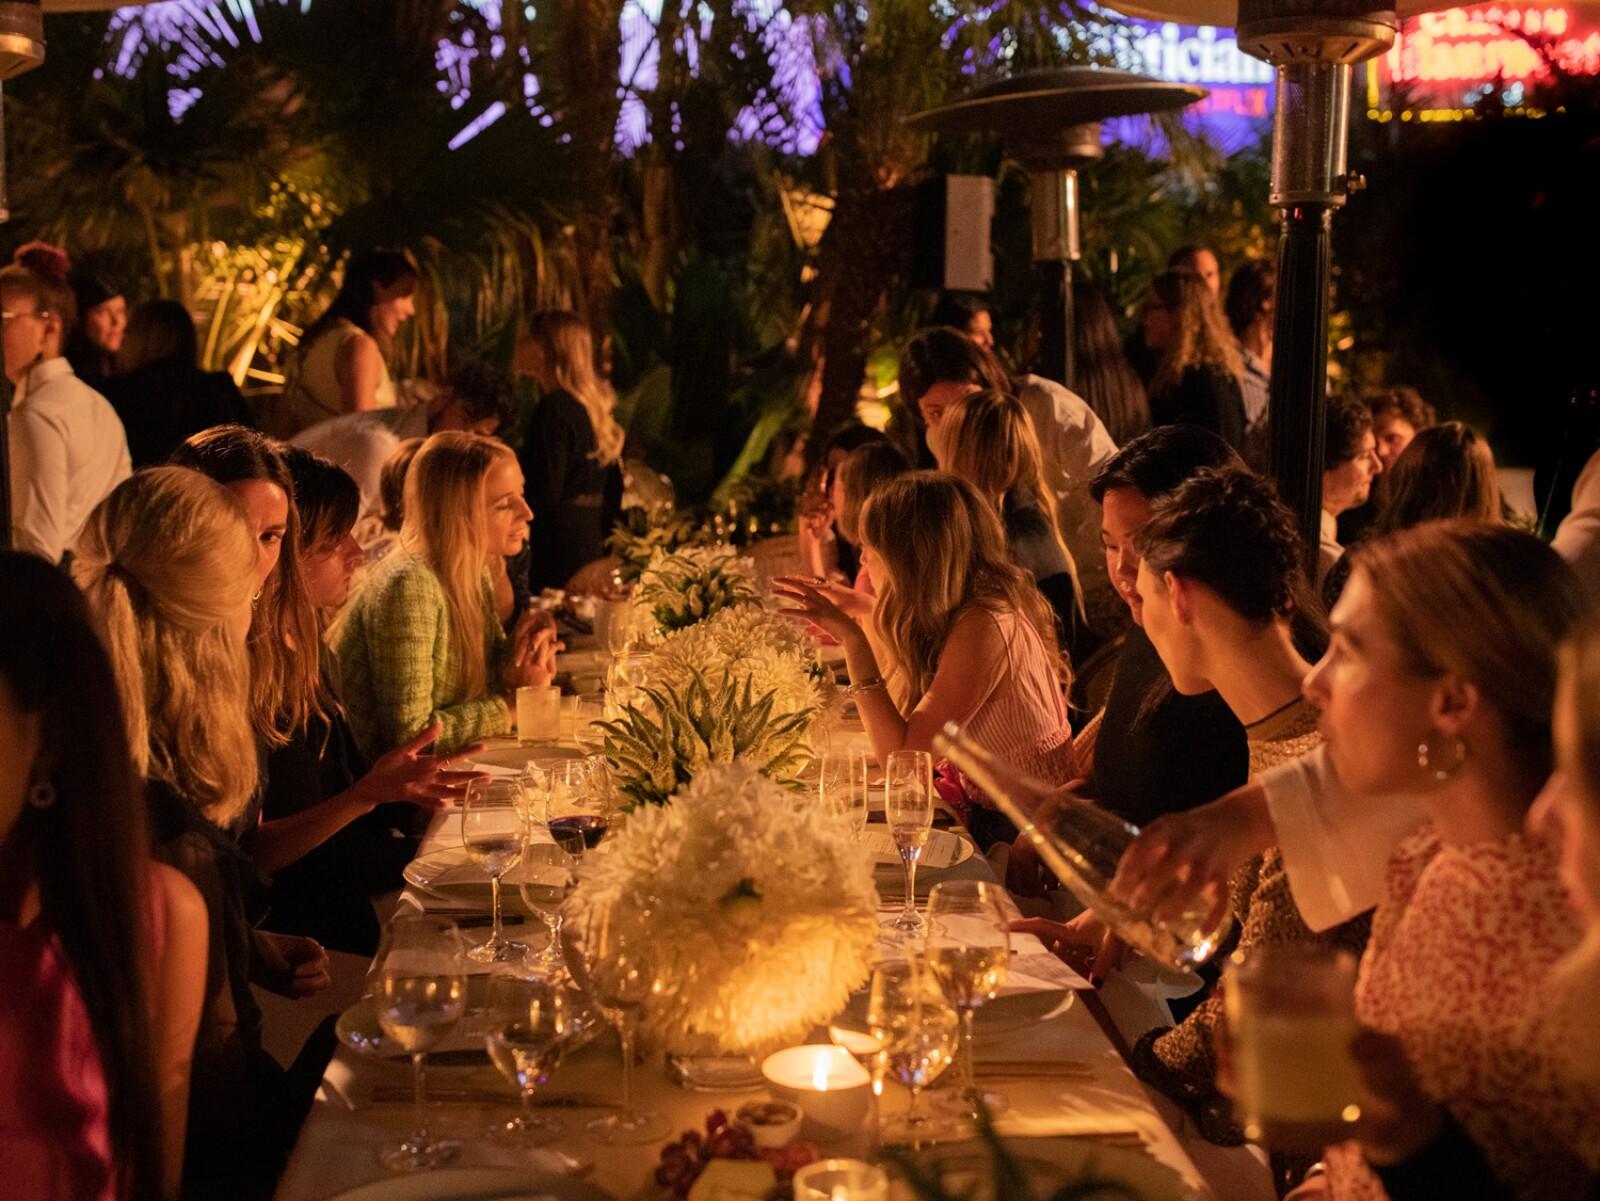 Atmosphere_Gabrielle CHANEL Essence_Dinner_Hosted by Margot ROBBIE_September_12th_2.jpg